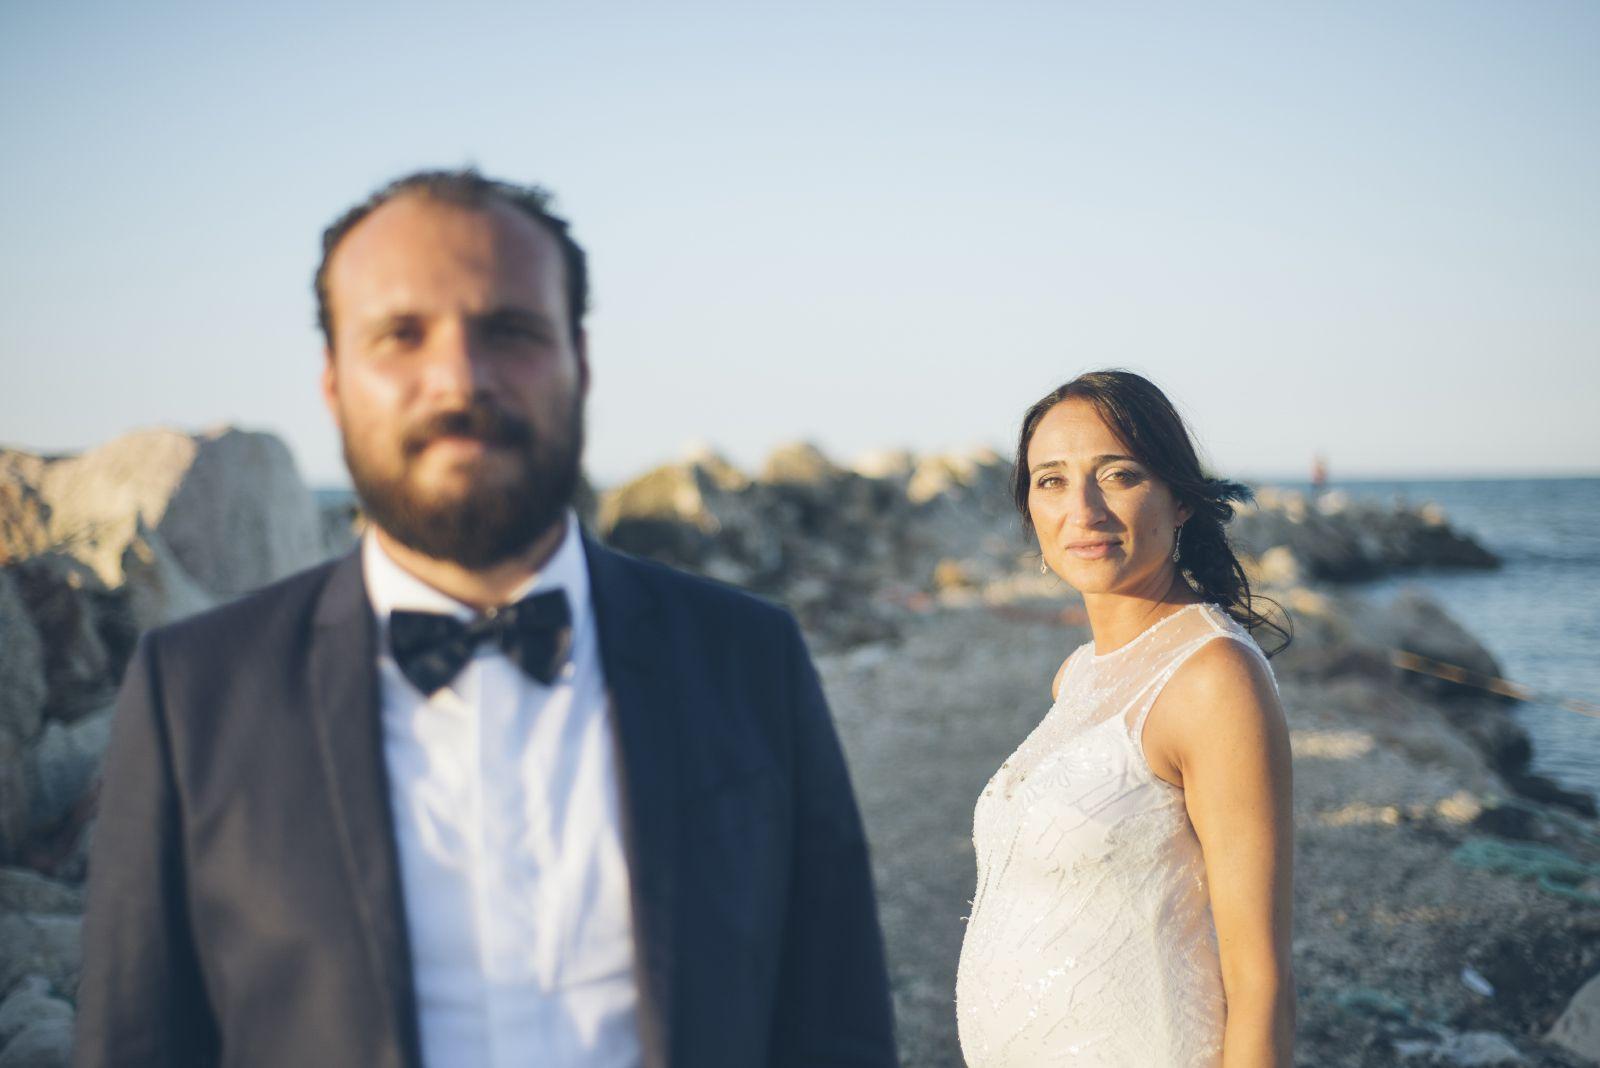 Danilo Giungato Photographer - Wedding Portfolio. Wedding in italy, Destination…